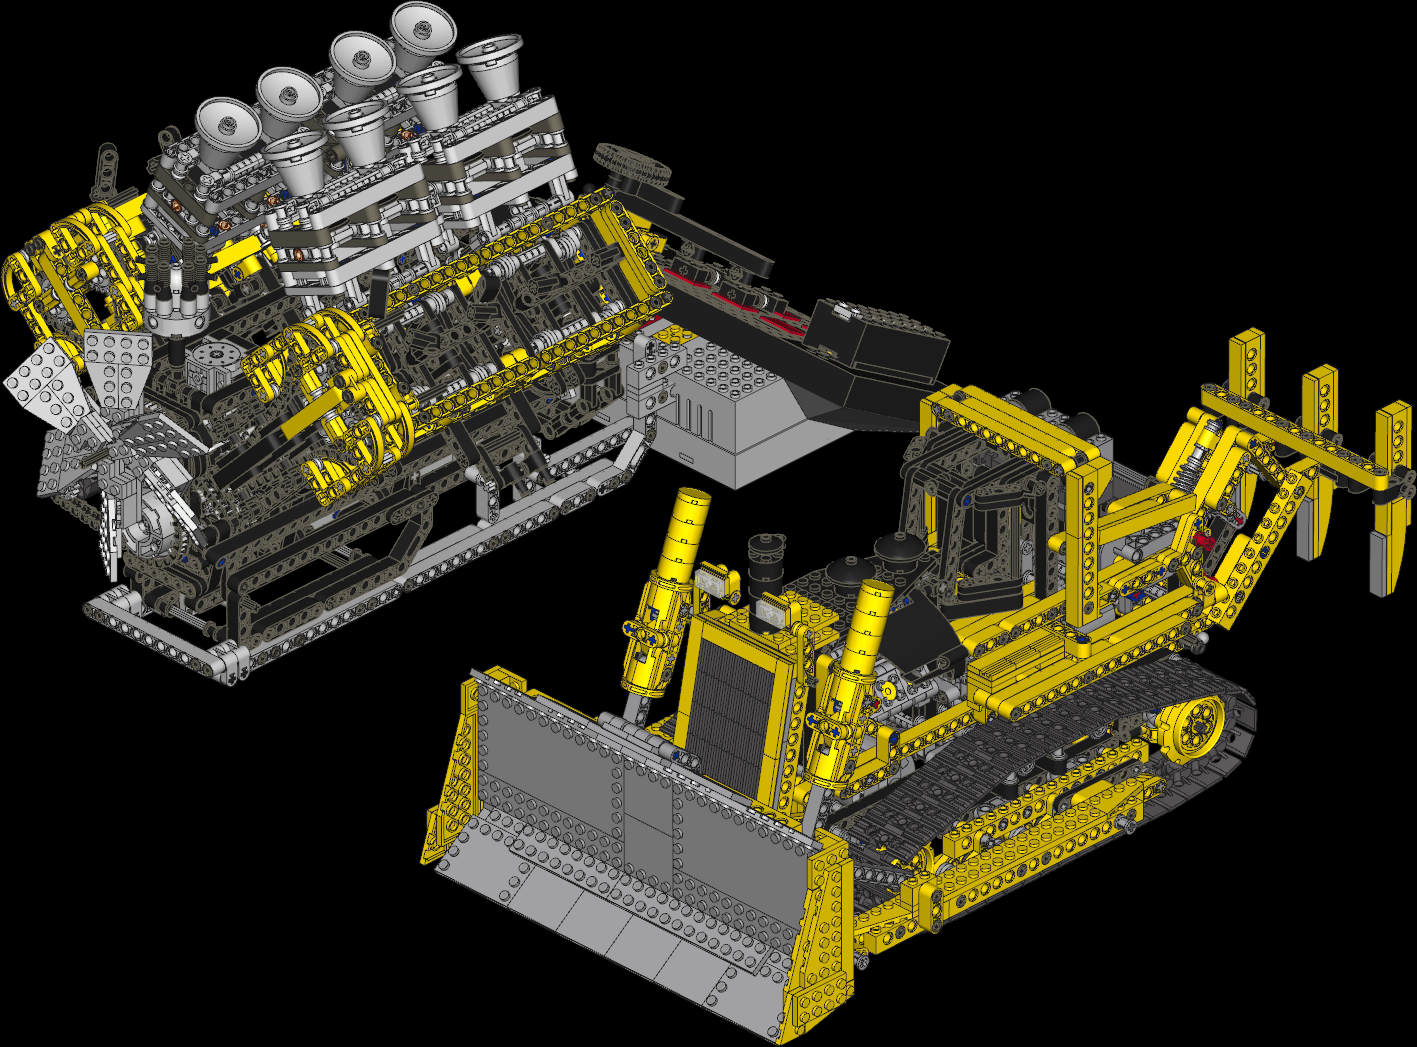 Barmans V 8 Engine Building Instructions 2862 Parts Lego